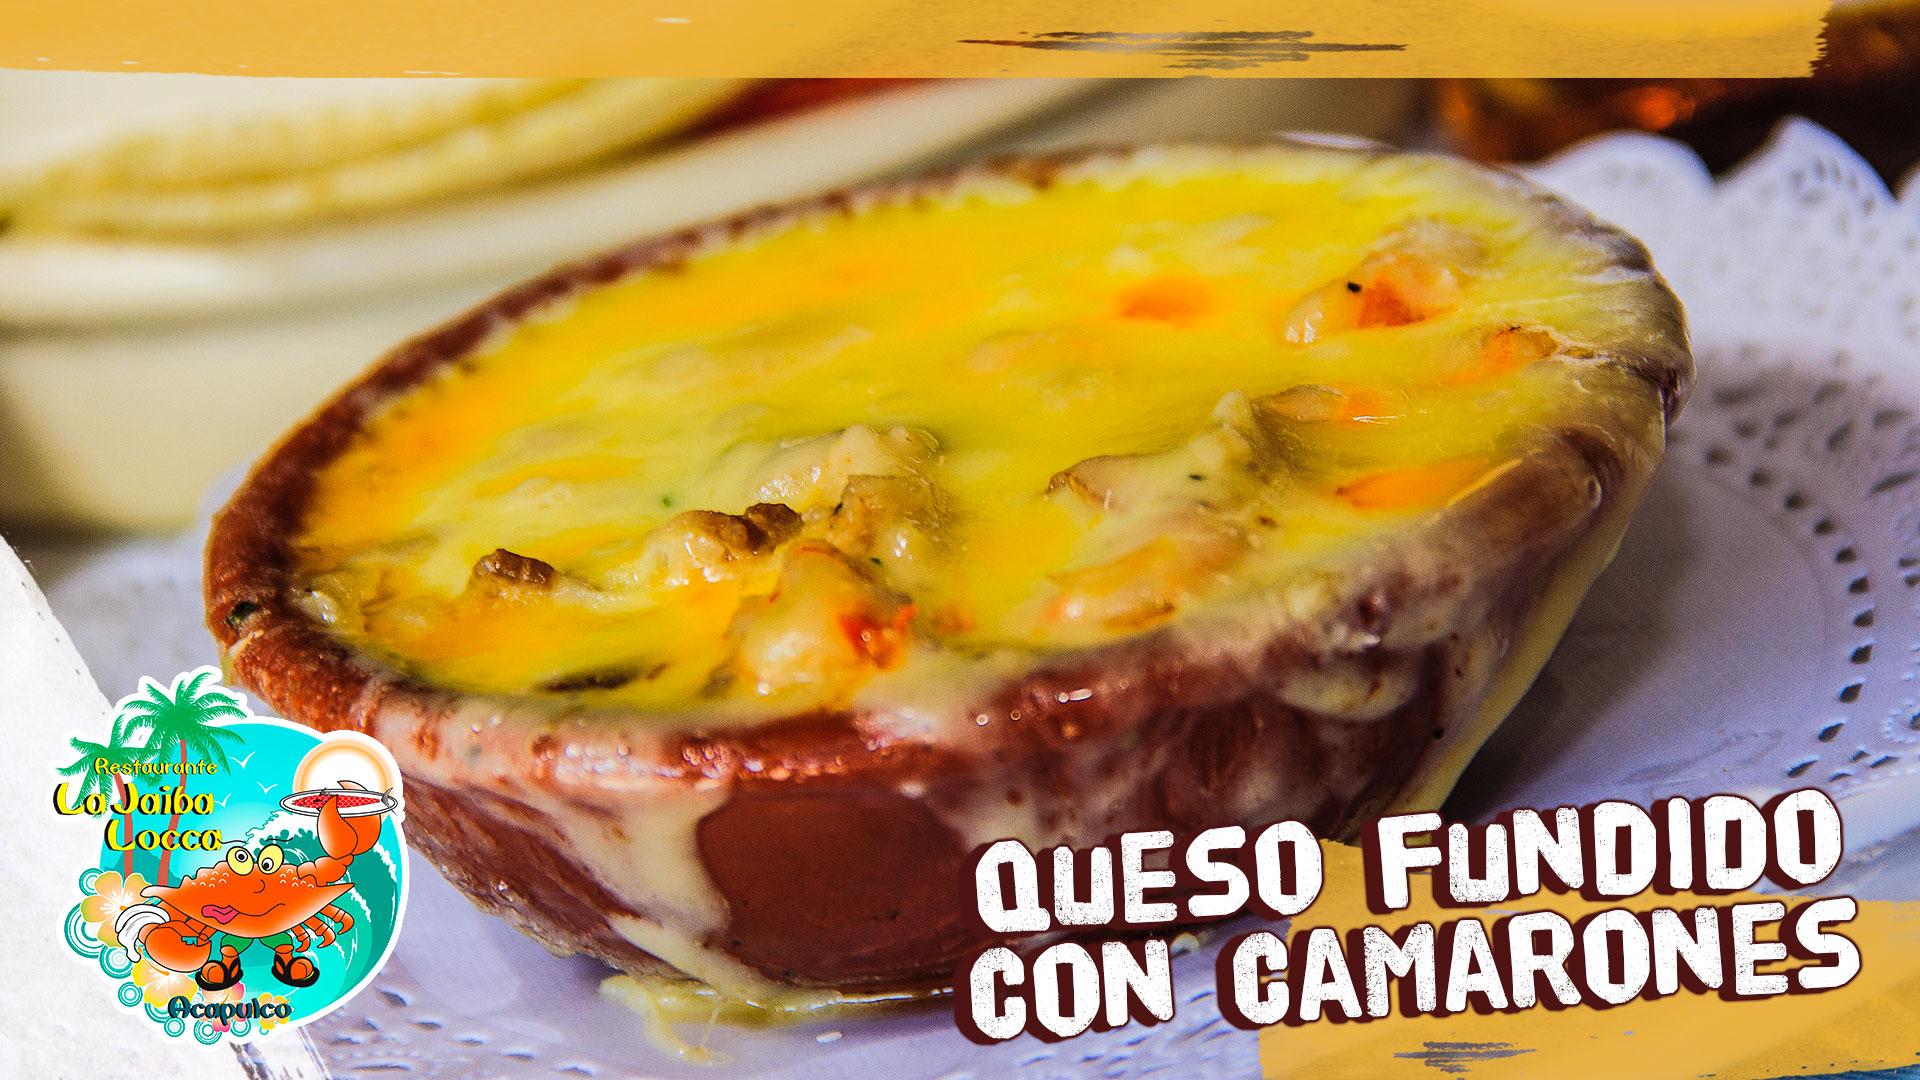 https://0201.nccdn.net/1_2/000/000/0d6/5f1/33-Queso-Fundido-con-Camarones.jpg